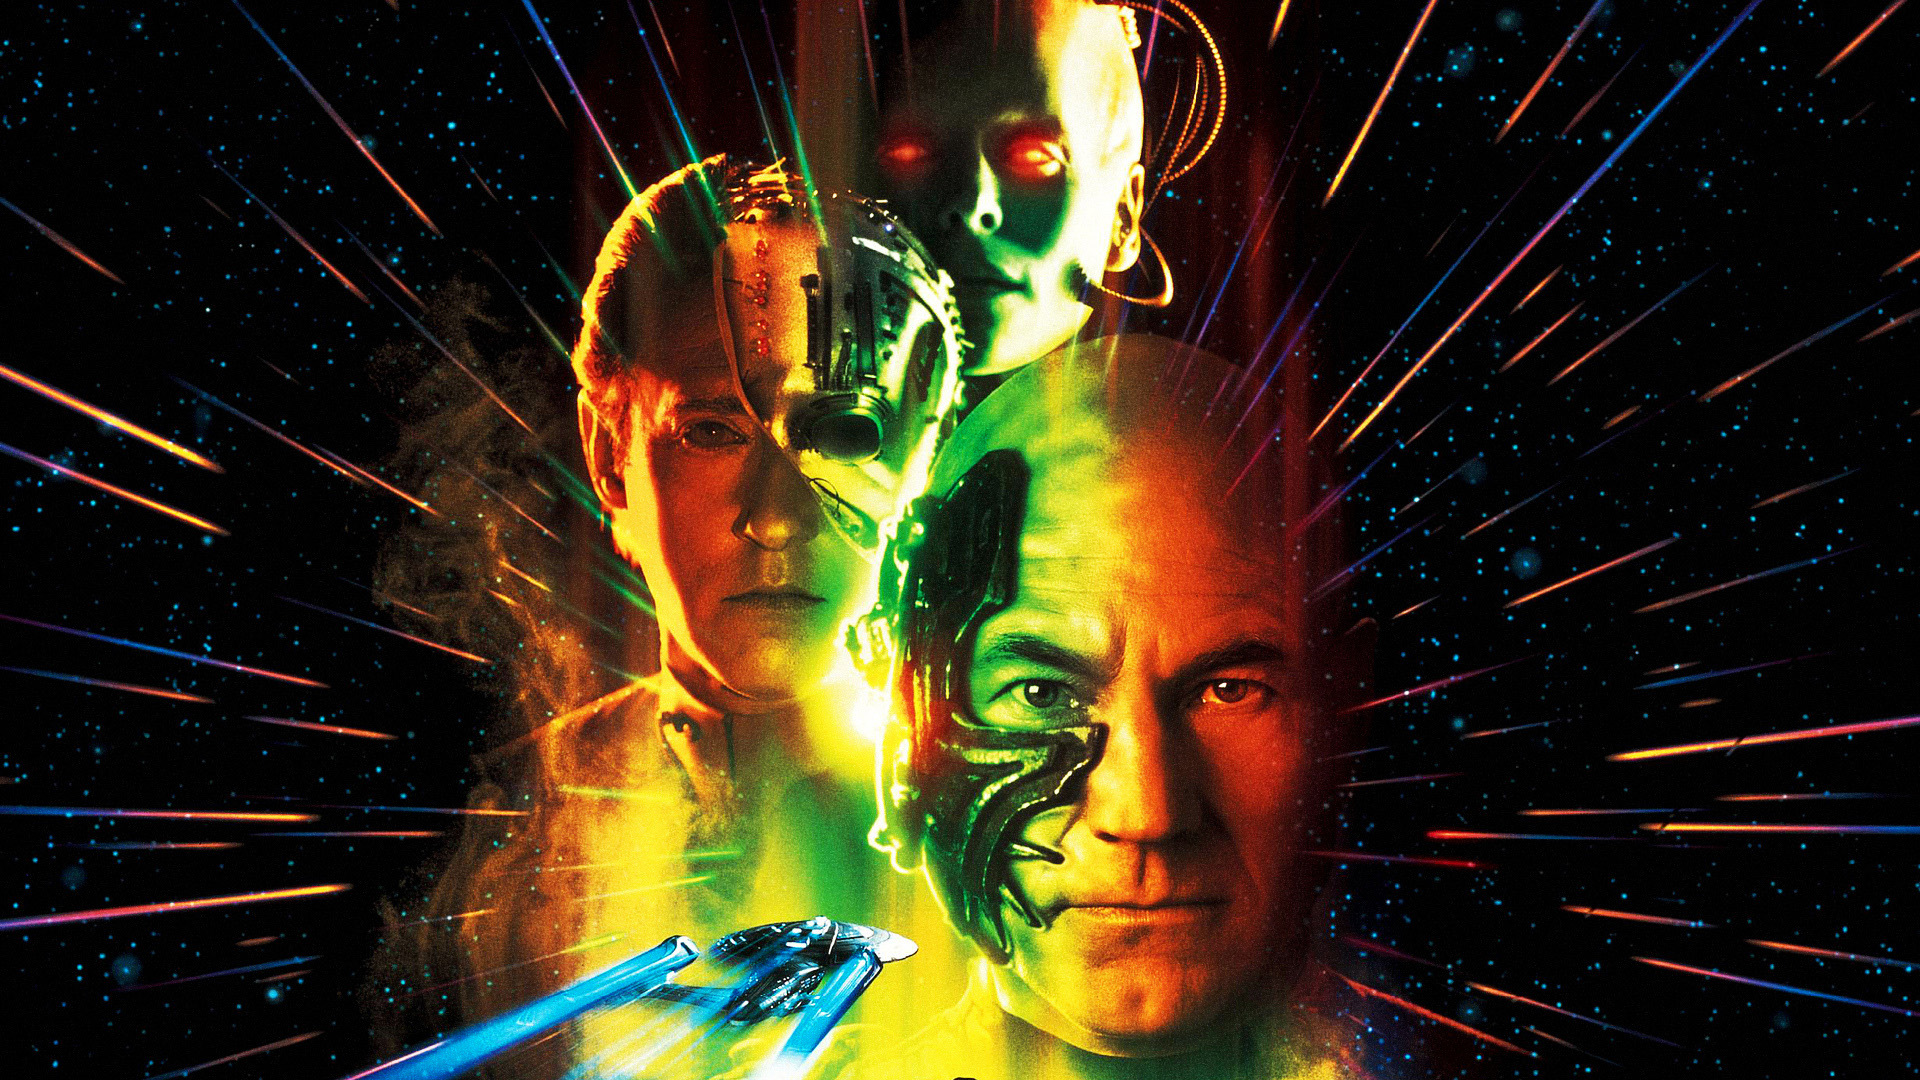 Star Trek First Contact Movie Wallpapers WallpapersIn4knet 1920x1080